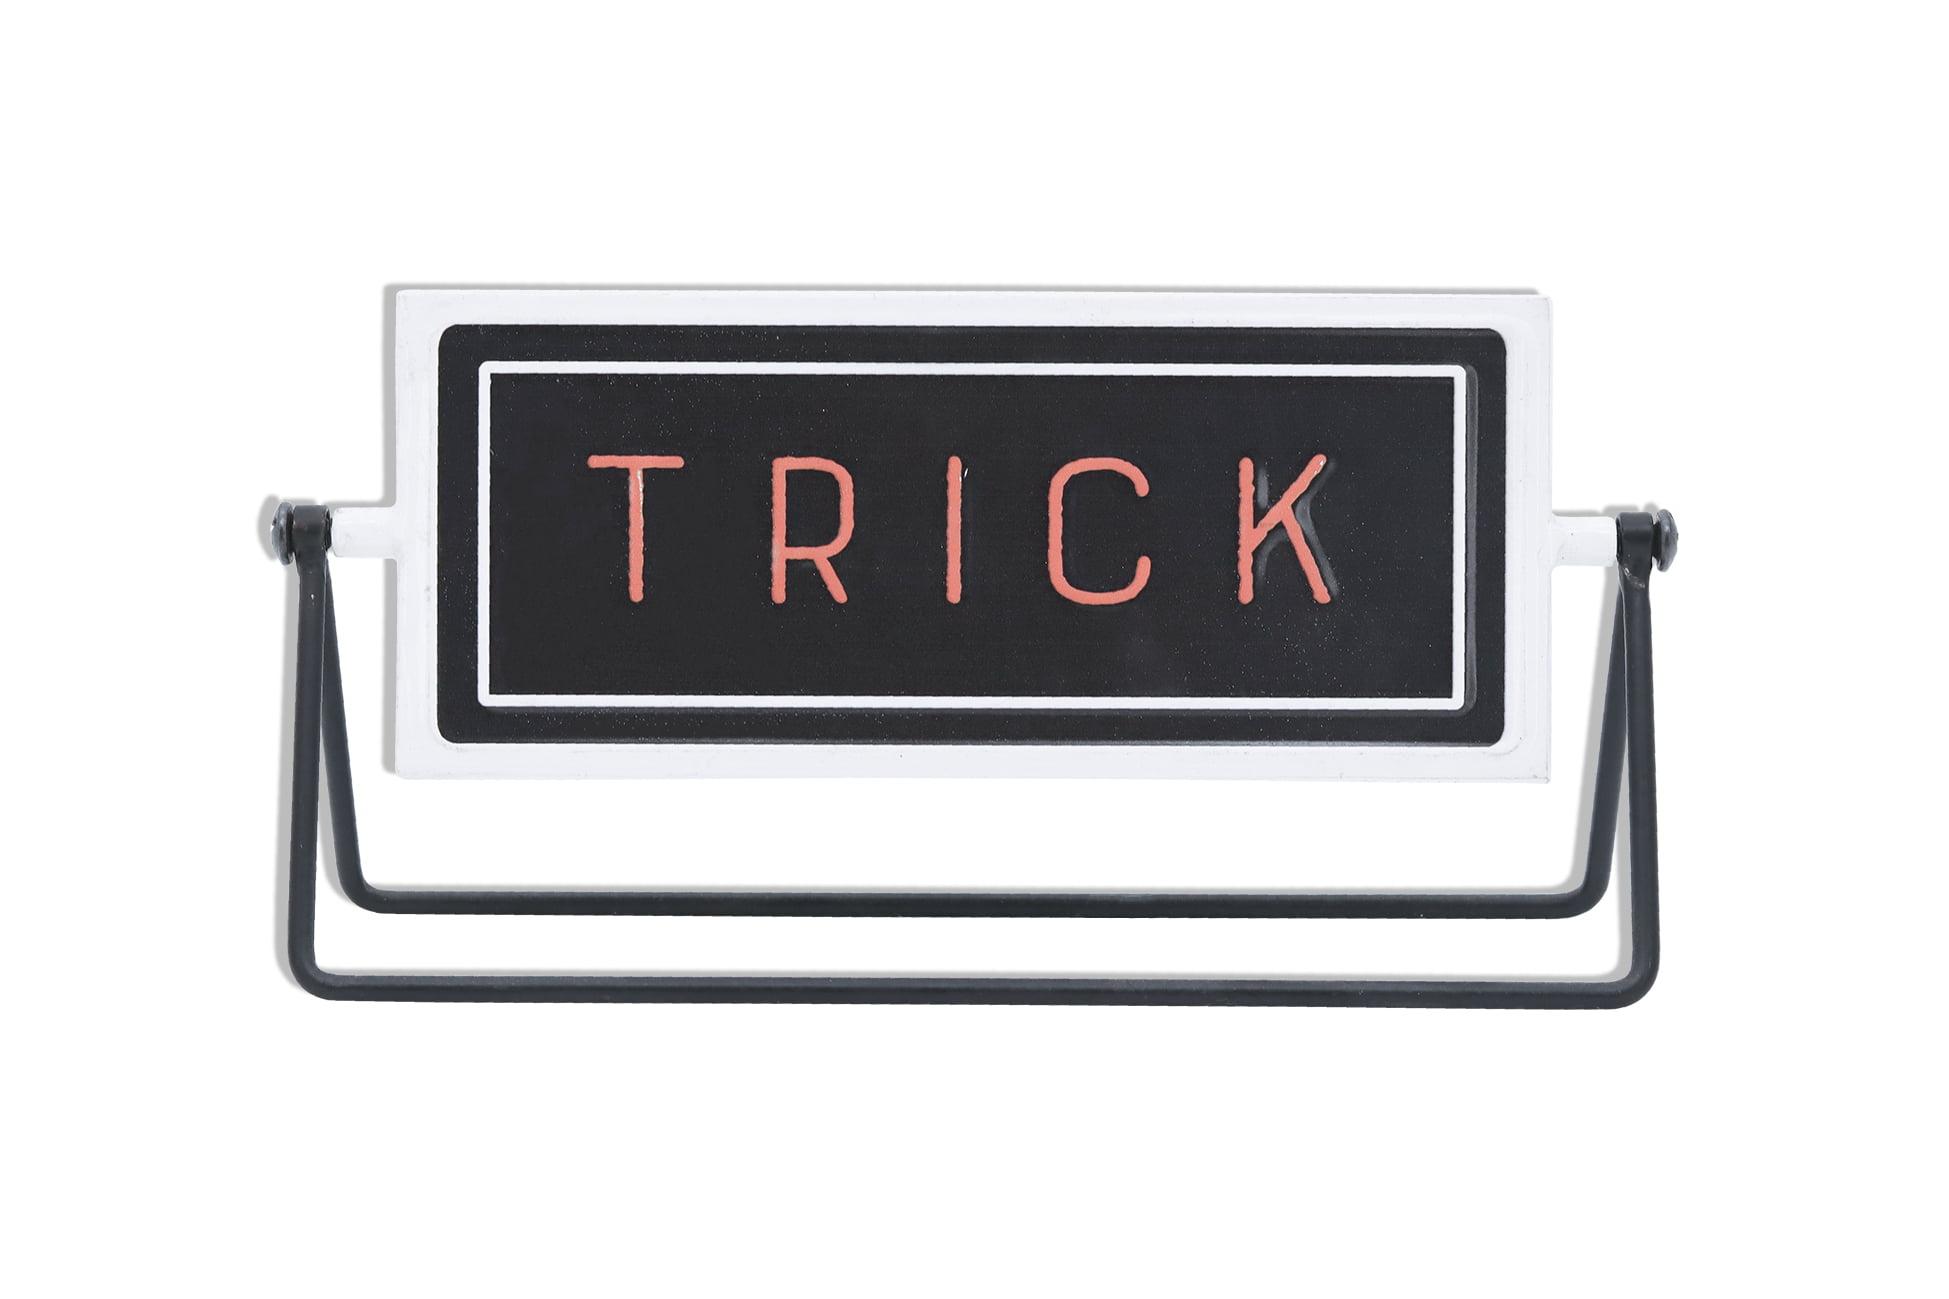 Parisloft Trick Or Treat Metal Rotating Tabletop Holiday Sign Freestanding Halloween Decoration 12 X 3 125 X 4 875 Inches Walmart Com Walmart Com